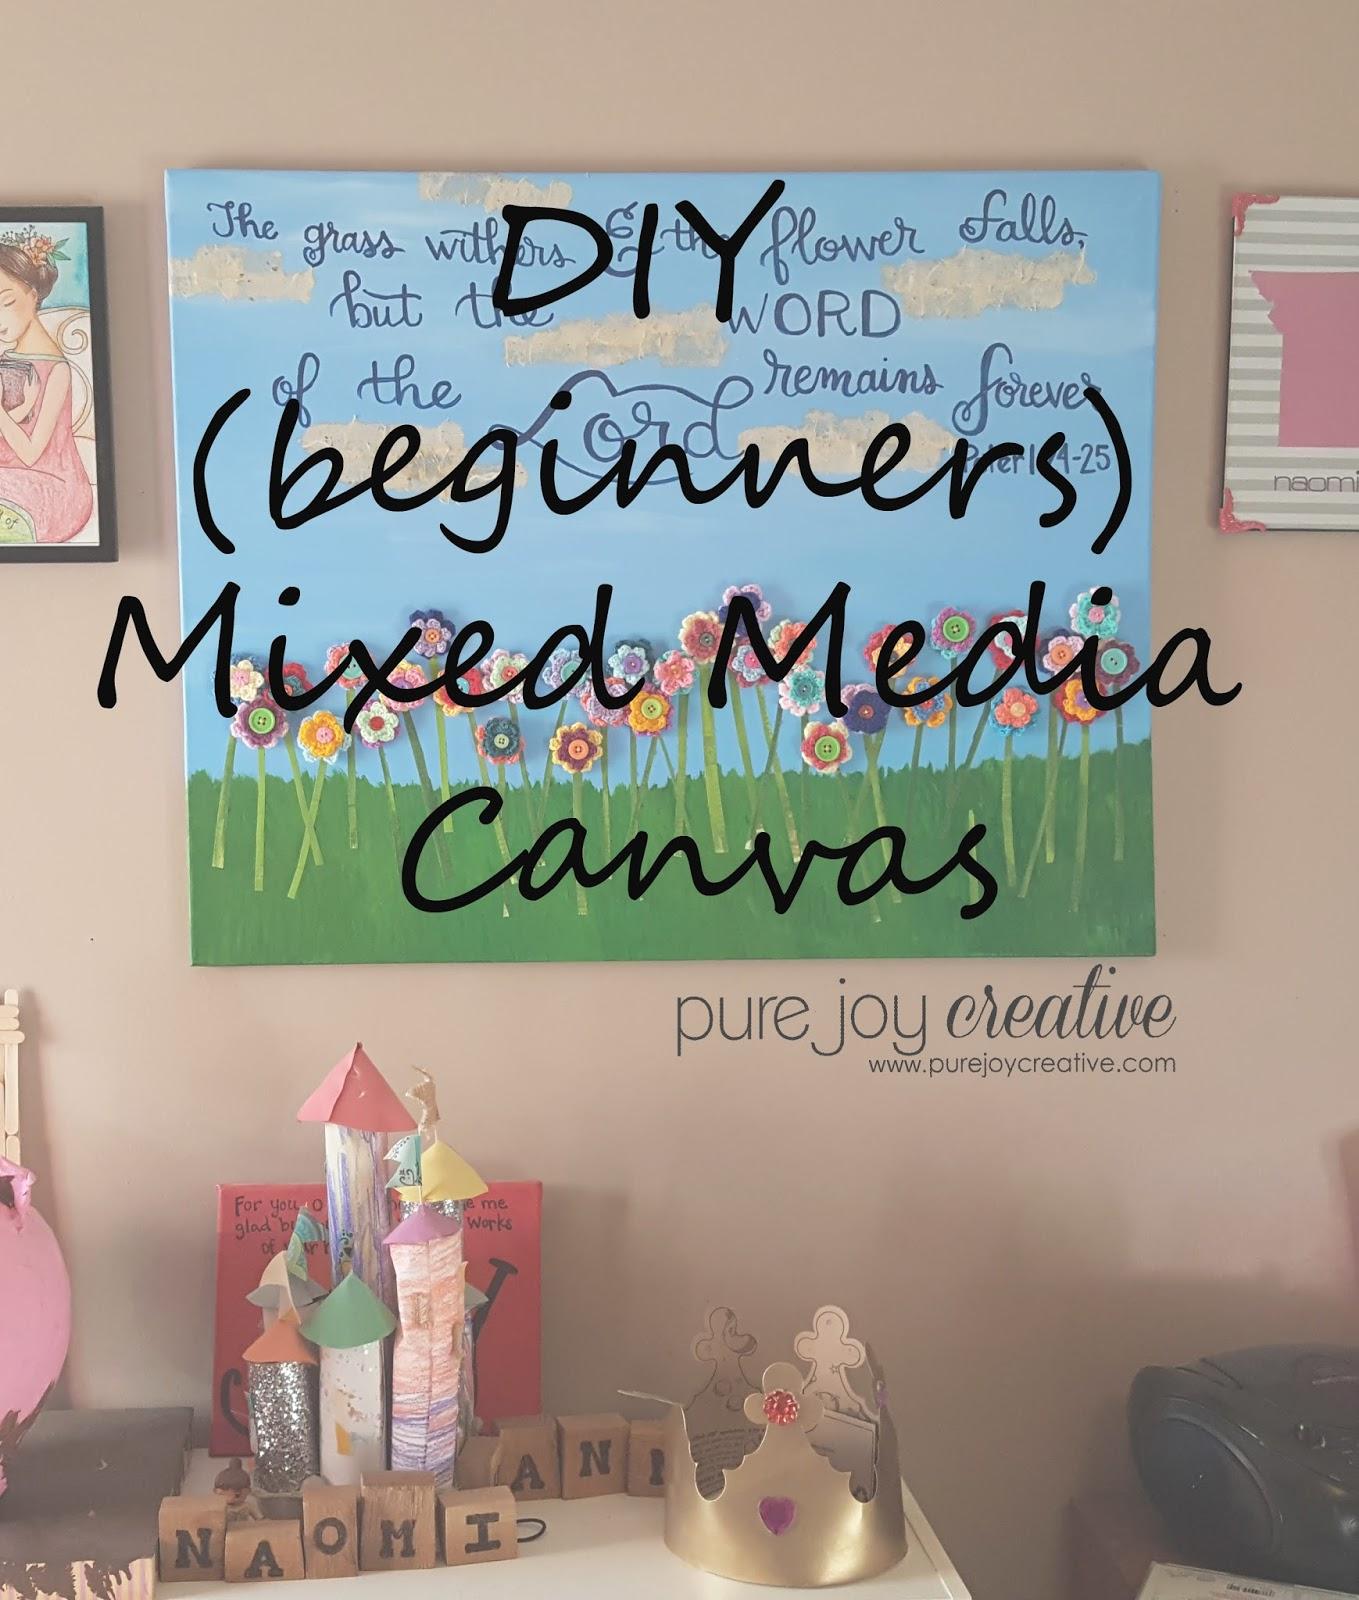 Diy beginners mixed media canvas a glimpse inside for Mixed media canvas art ideas